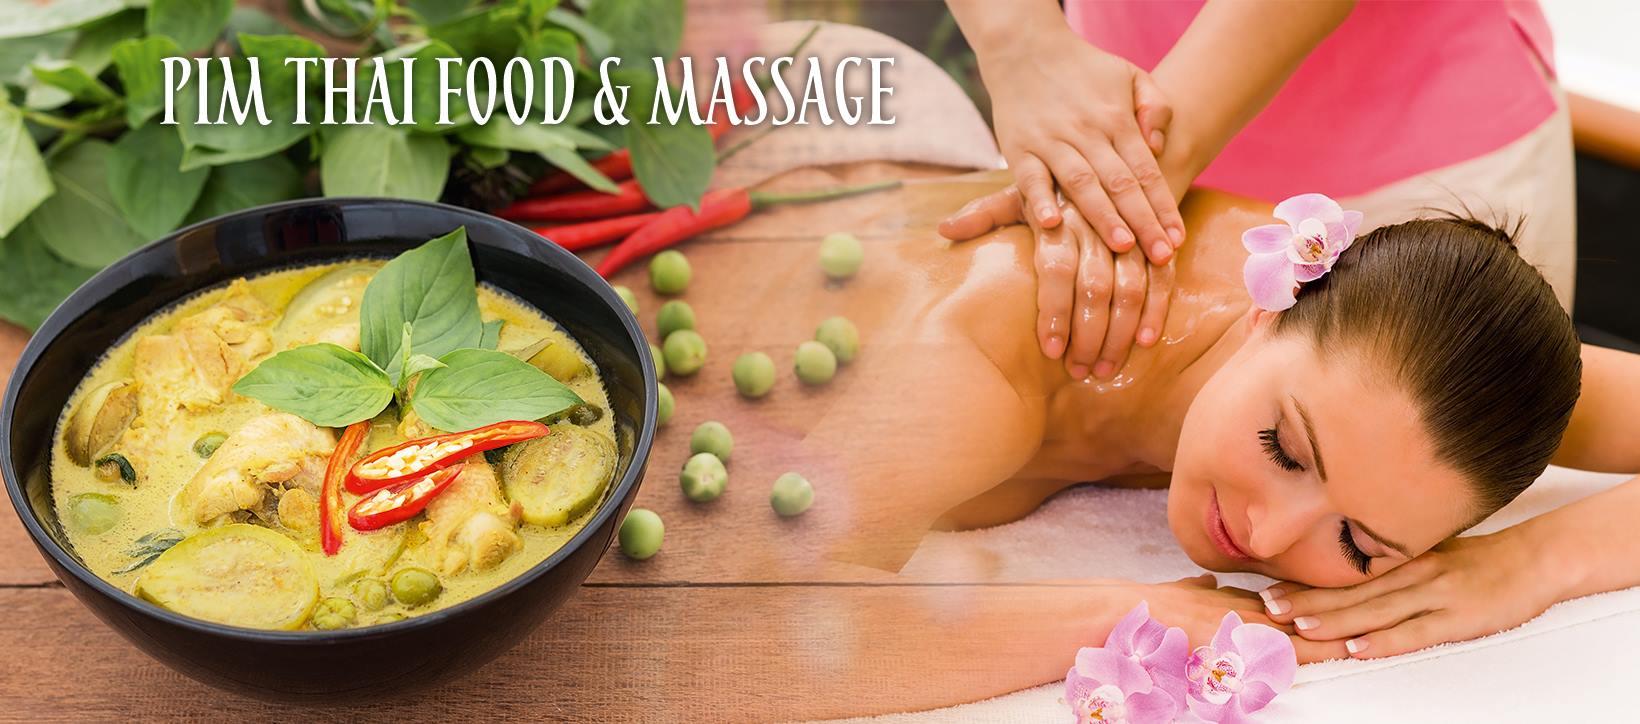 PIM-THAI : Massage & Thai Food Take away (Chastre / Brabant wallon)